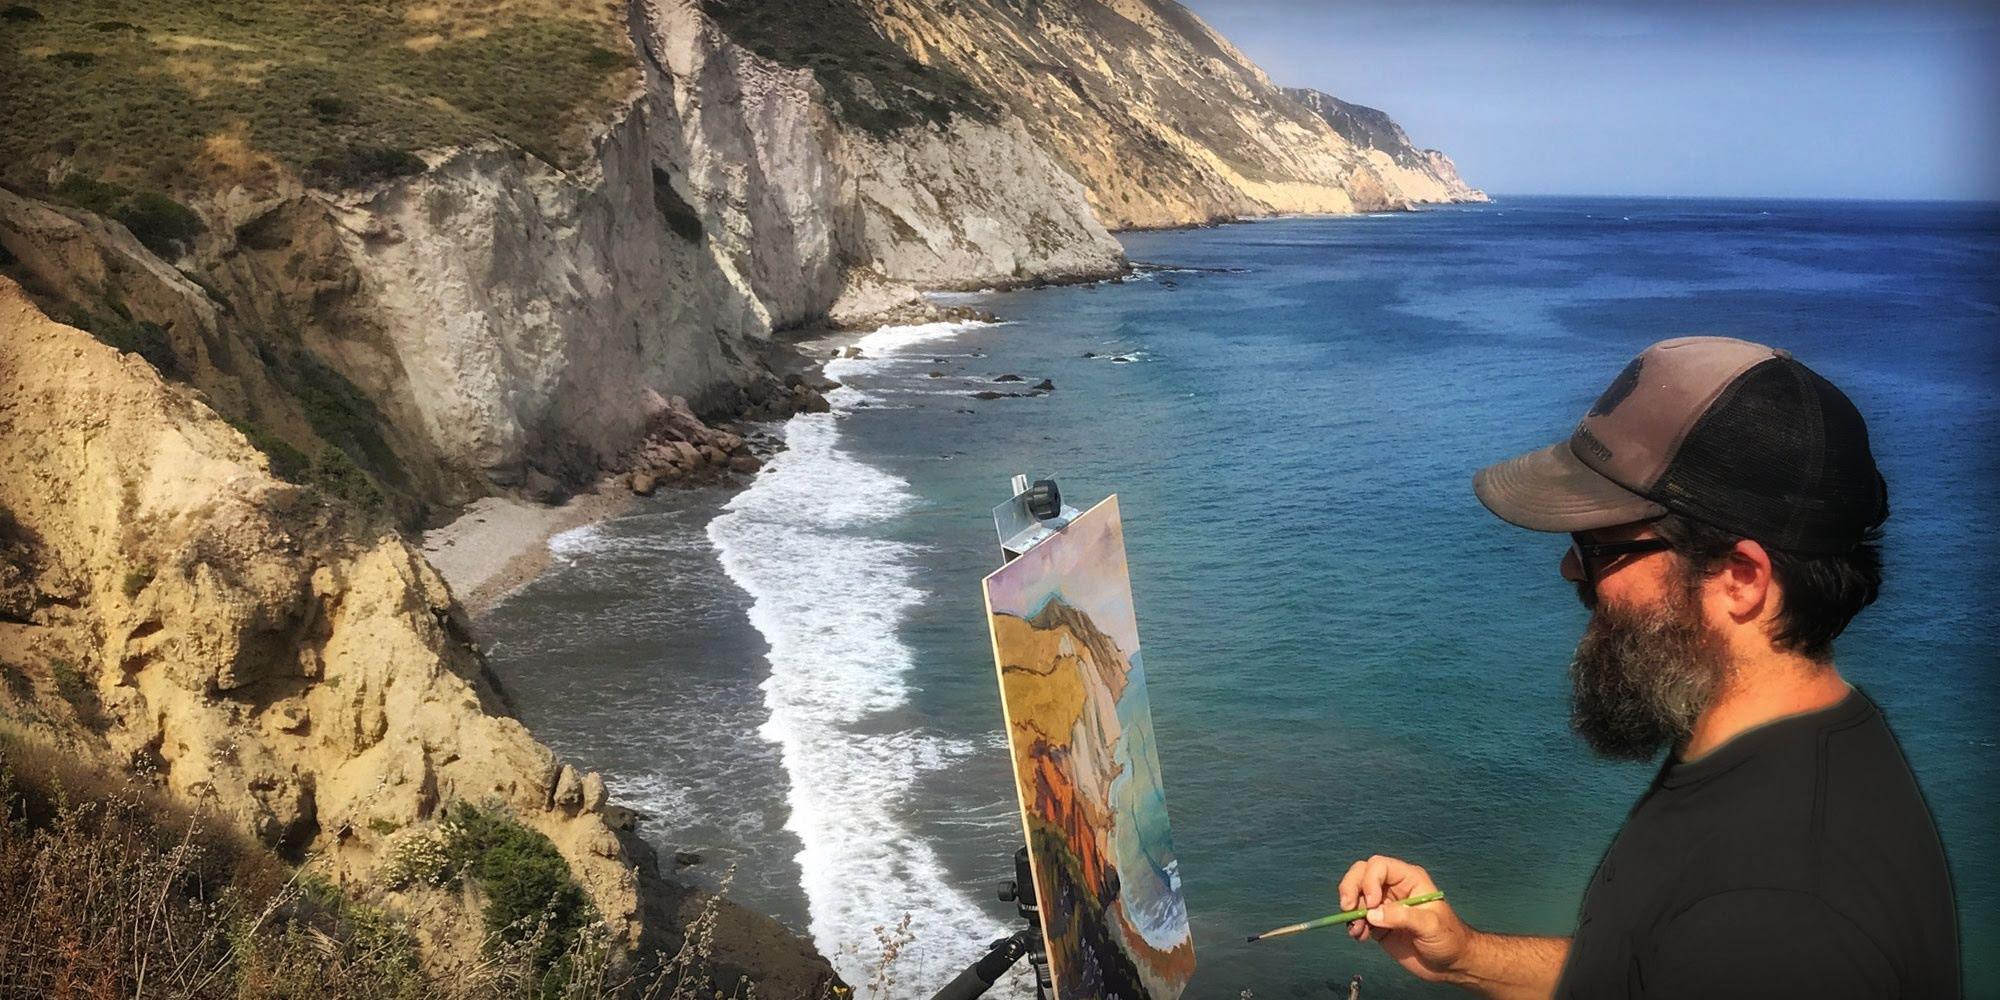 Artist Matt Beard painting plein air in the Channel Islands off the coast of California